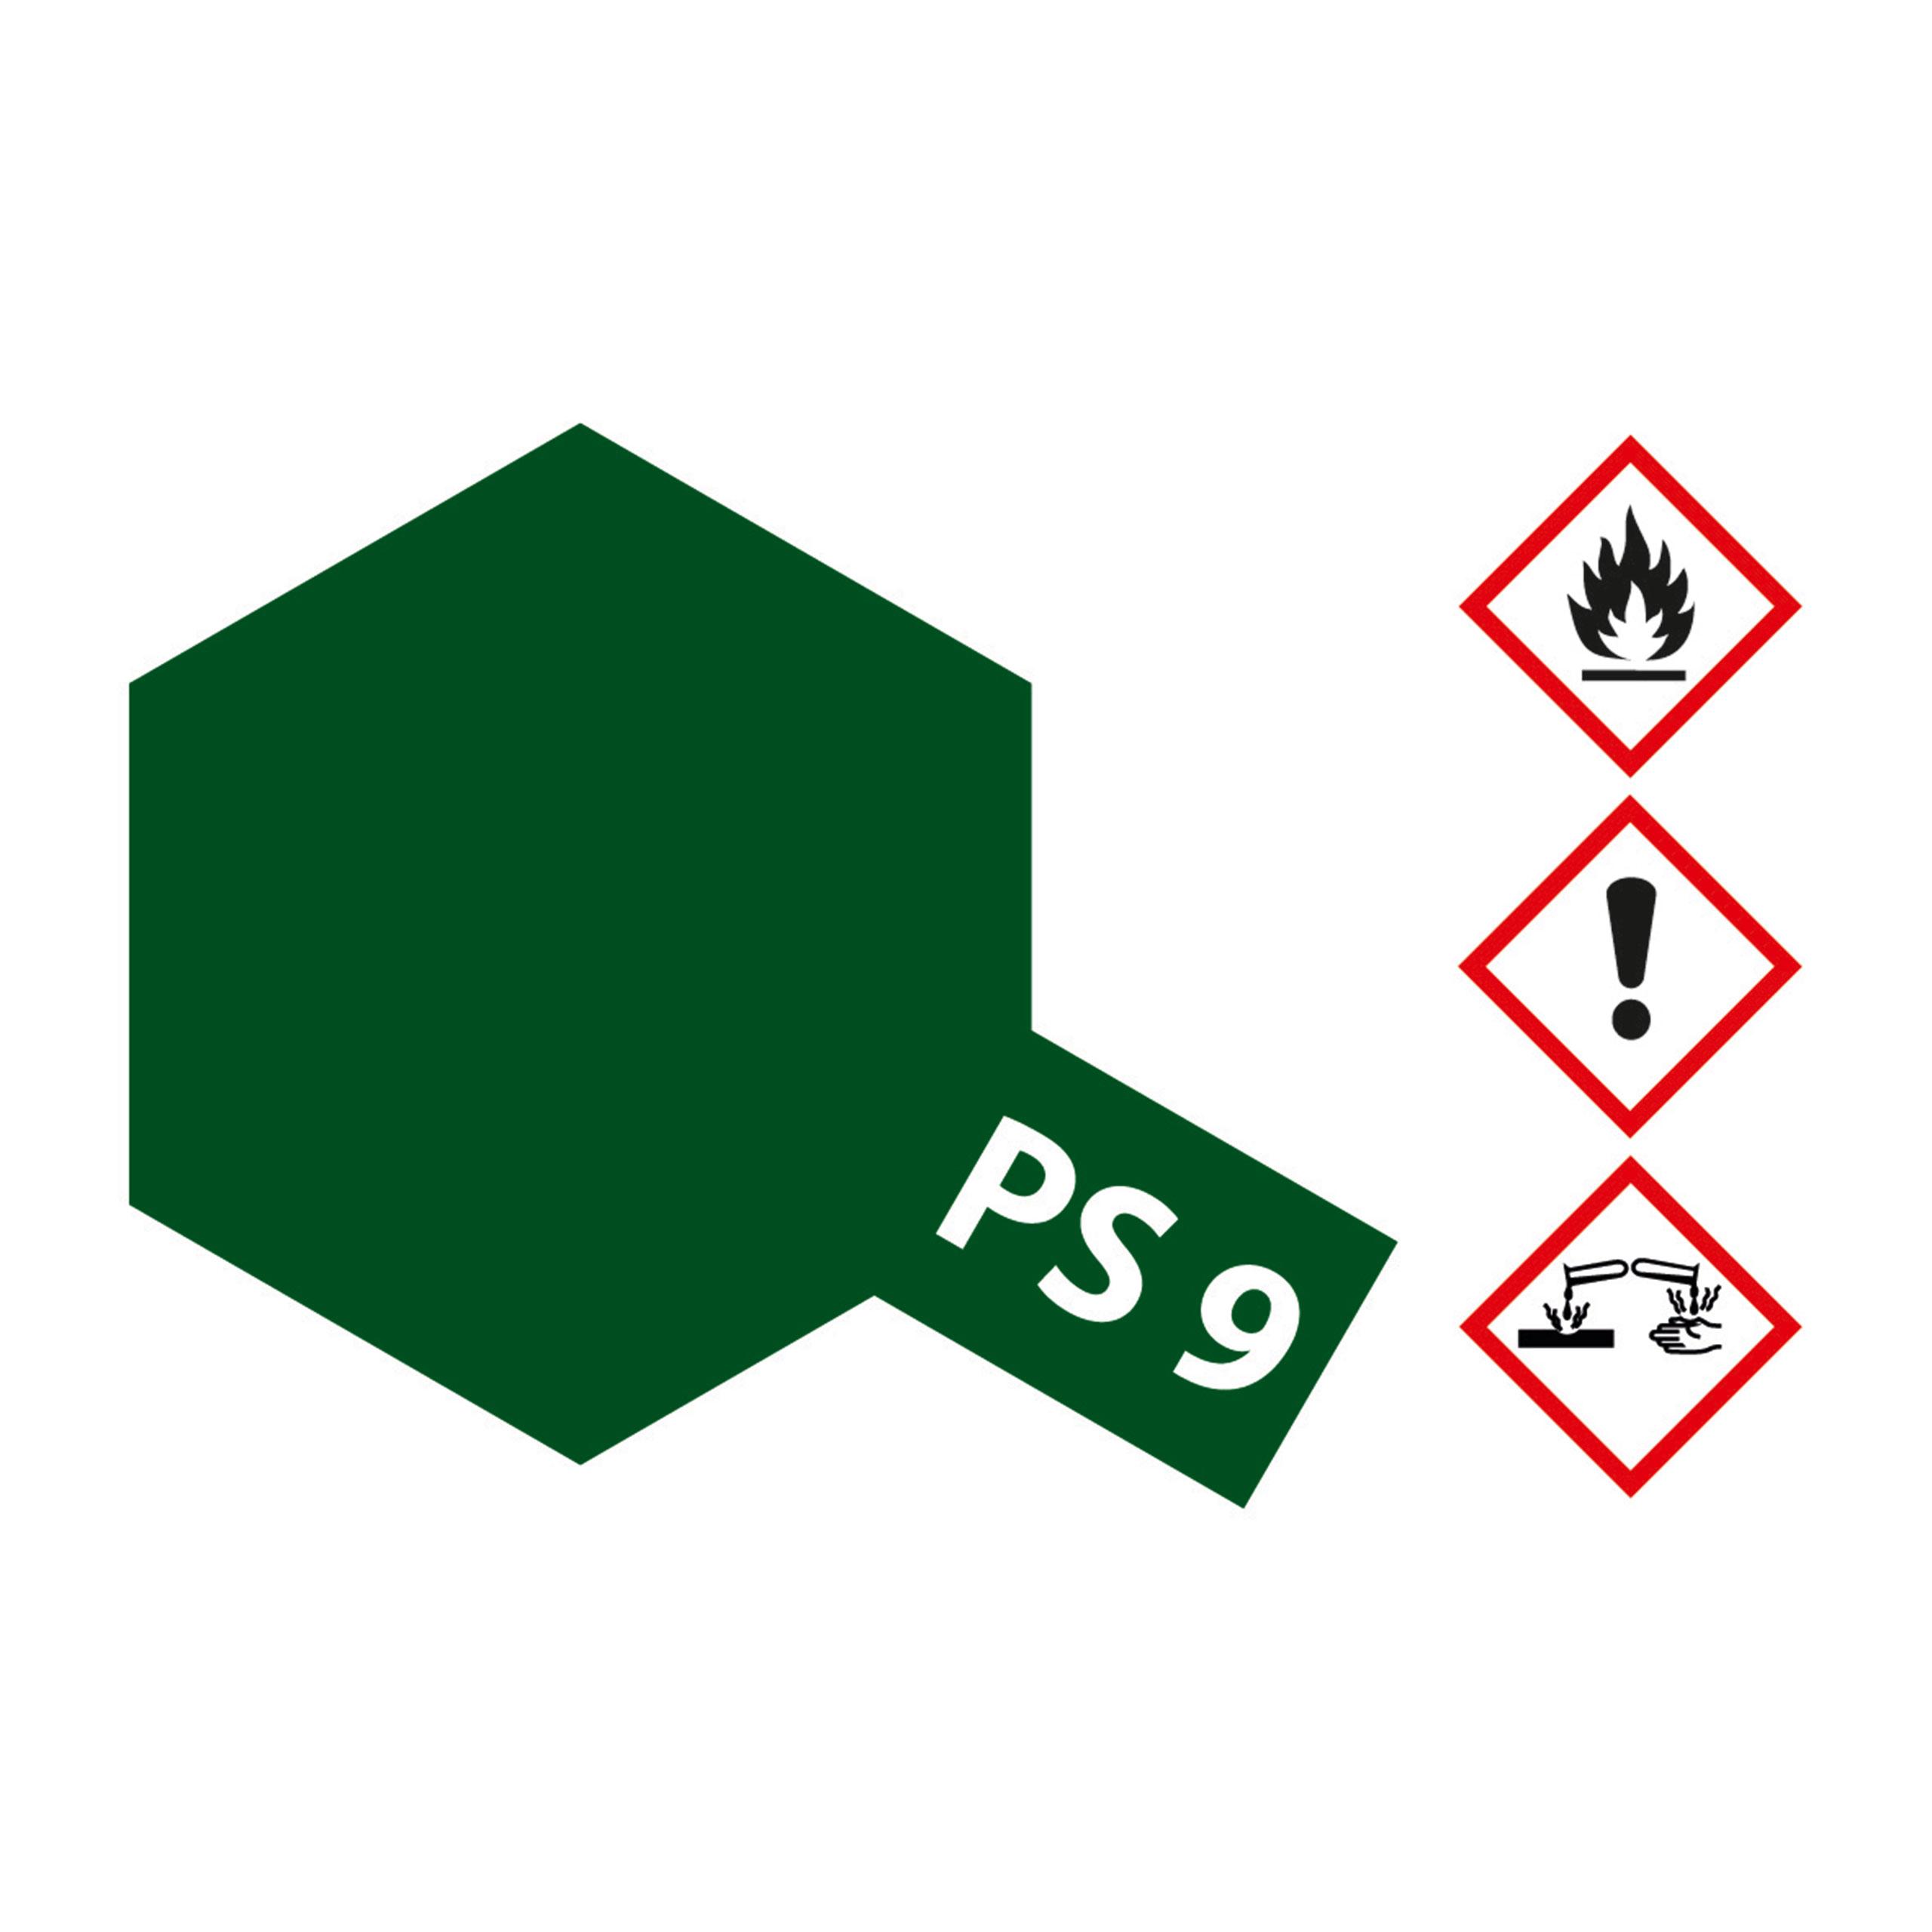 PS-9 Gruen Polycarbonat - 100ml Sprayfarbe Lexan - Tamiya 300086009